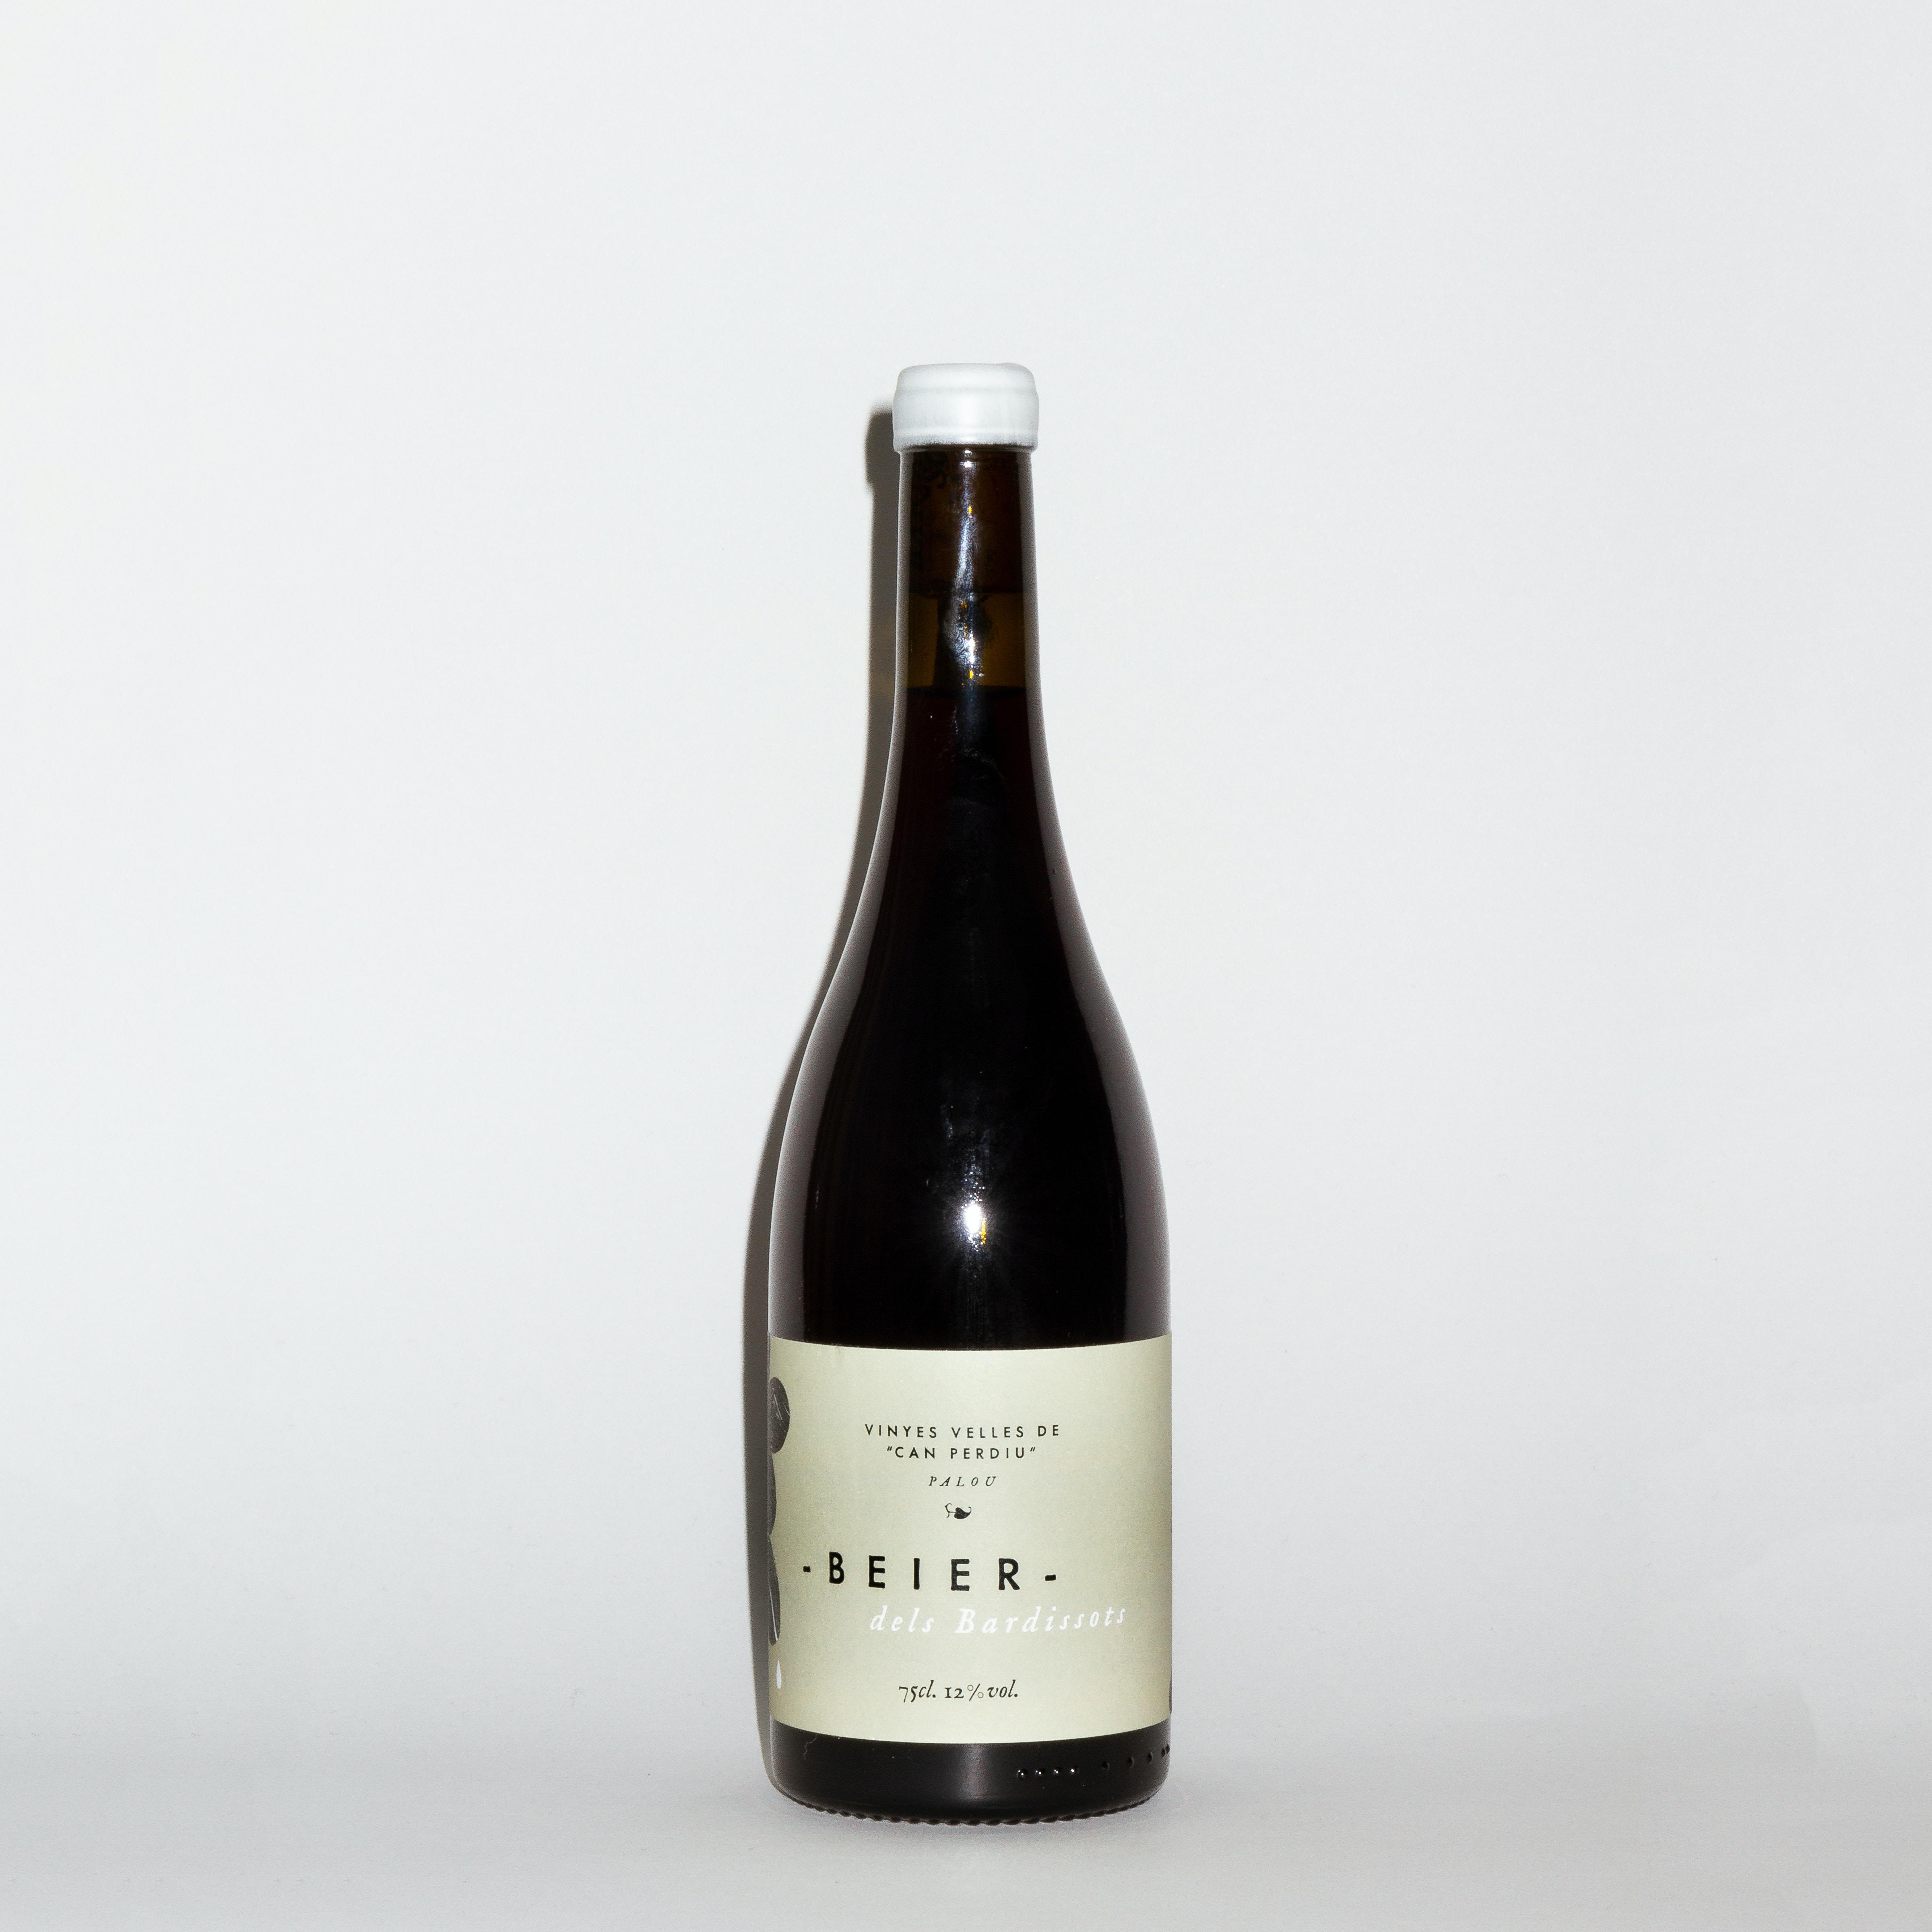 Beier 2017 by Oriol Artigas Viticultors